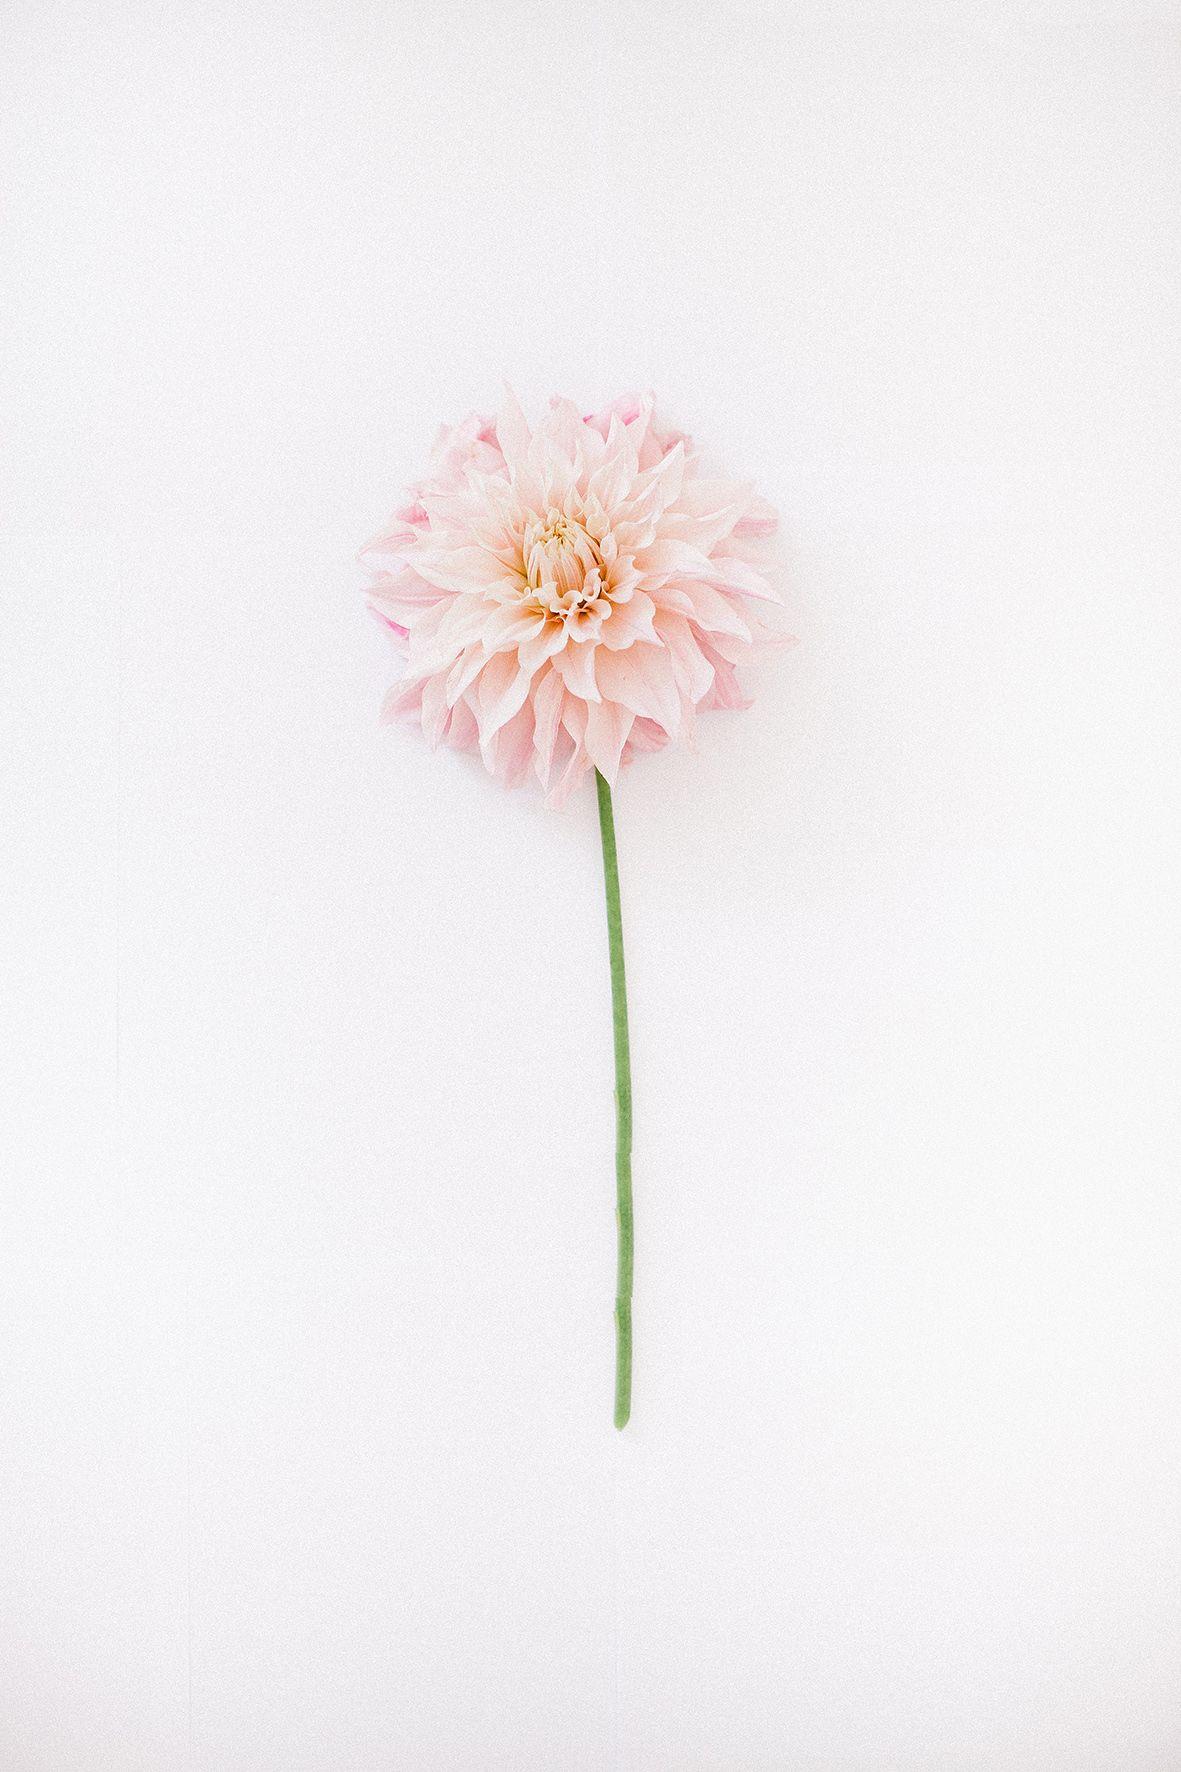 Blumenwiese Englisch dahlia tml f l o r a l g u i d e hintergrundbilder